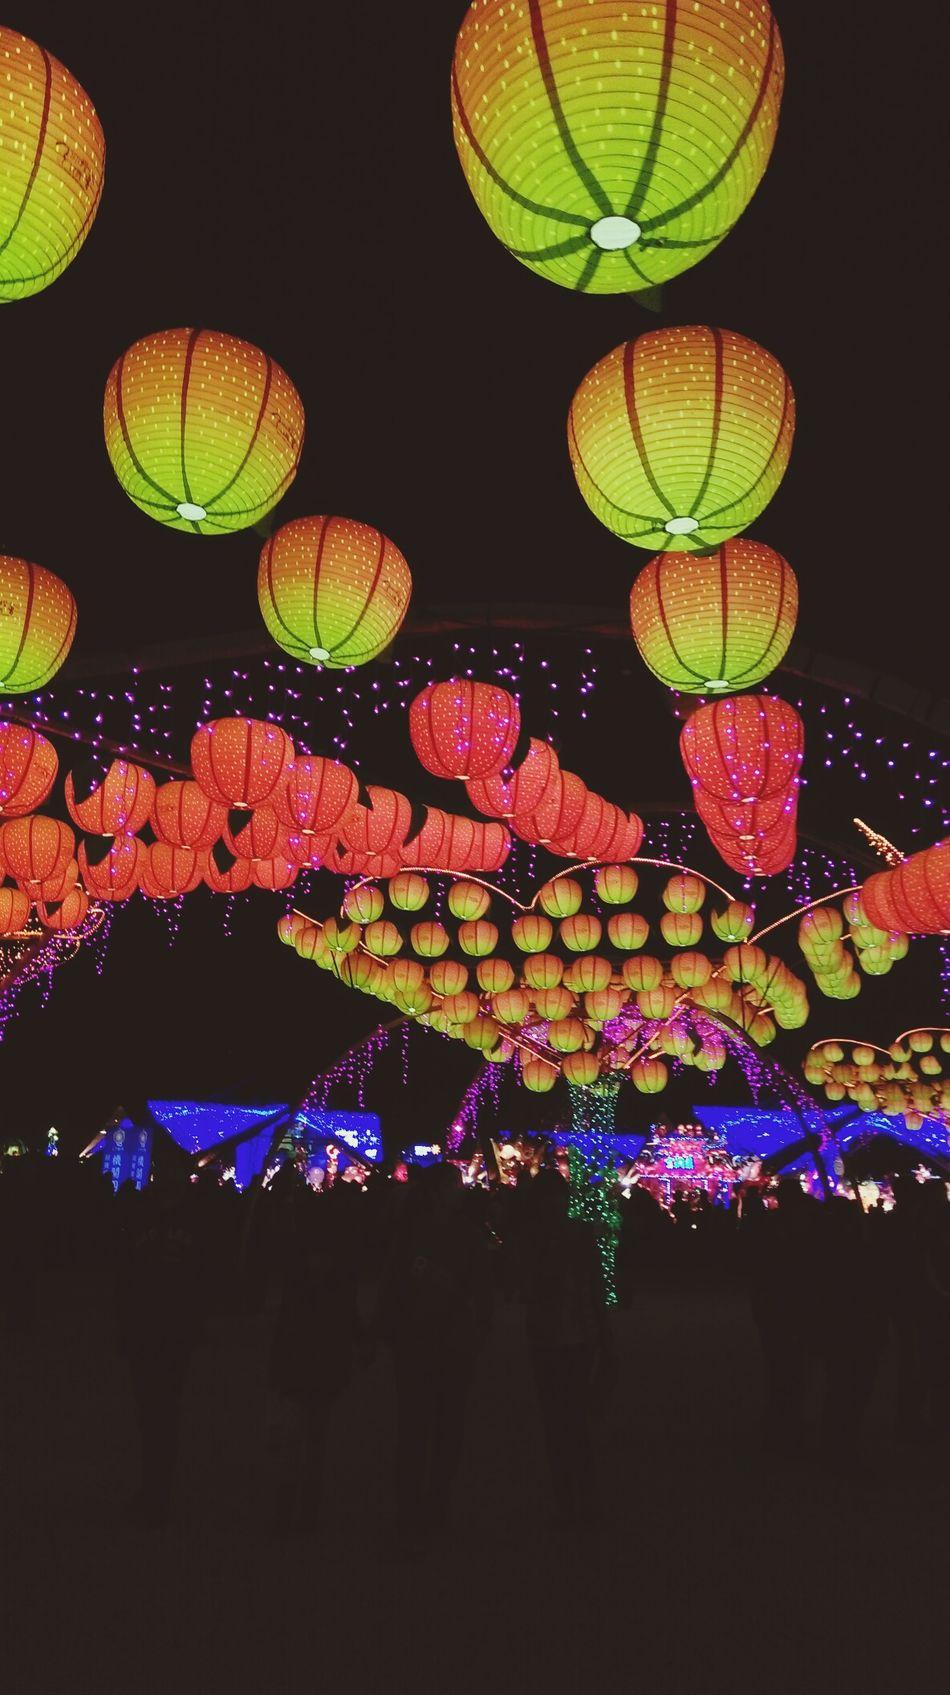 Taichung, Taiwan Lanternfestival Hanginglights Night Lights Light Up Your Life